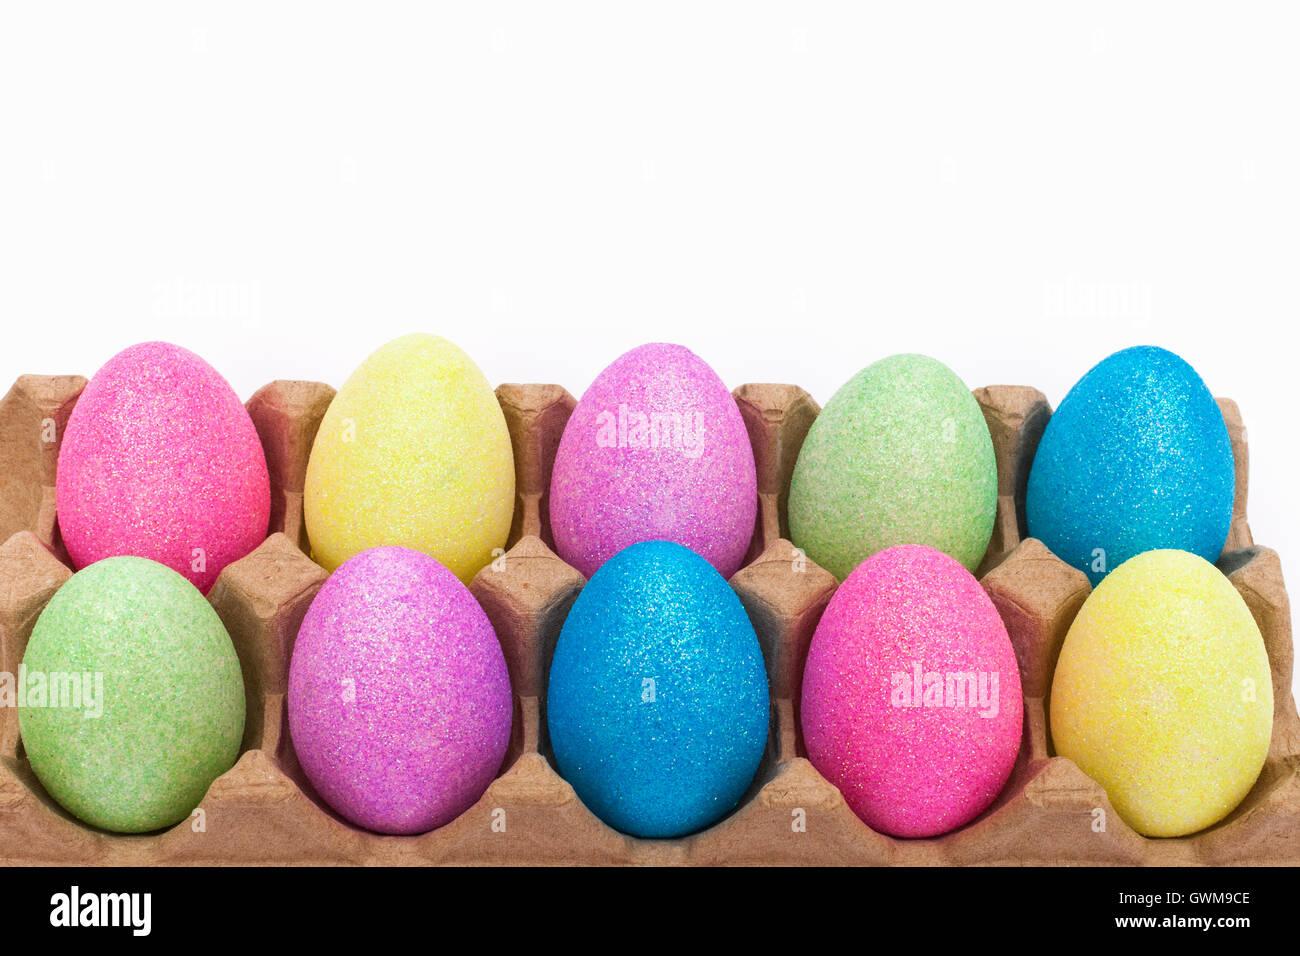 Glitter covered fake Easter eggs in an egg carton - Stock Image